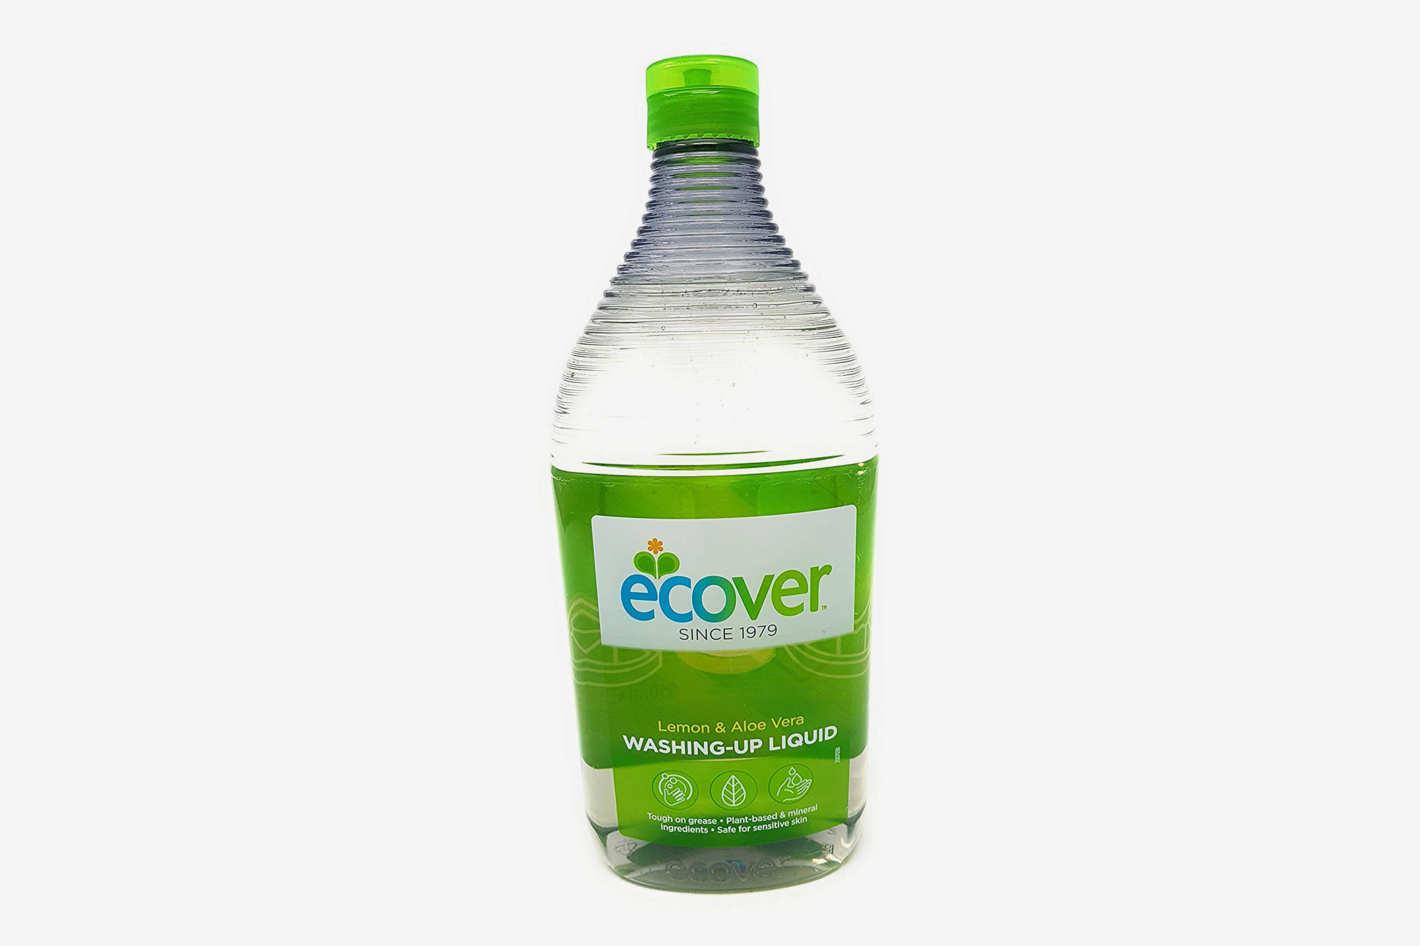 Ecover Washing-Up Liquid Lemon & Aloe Vera